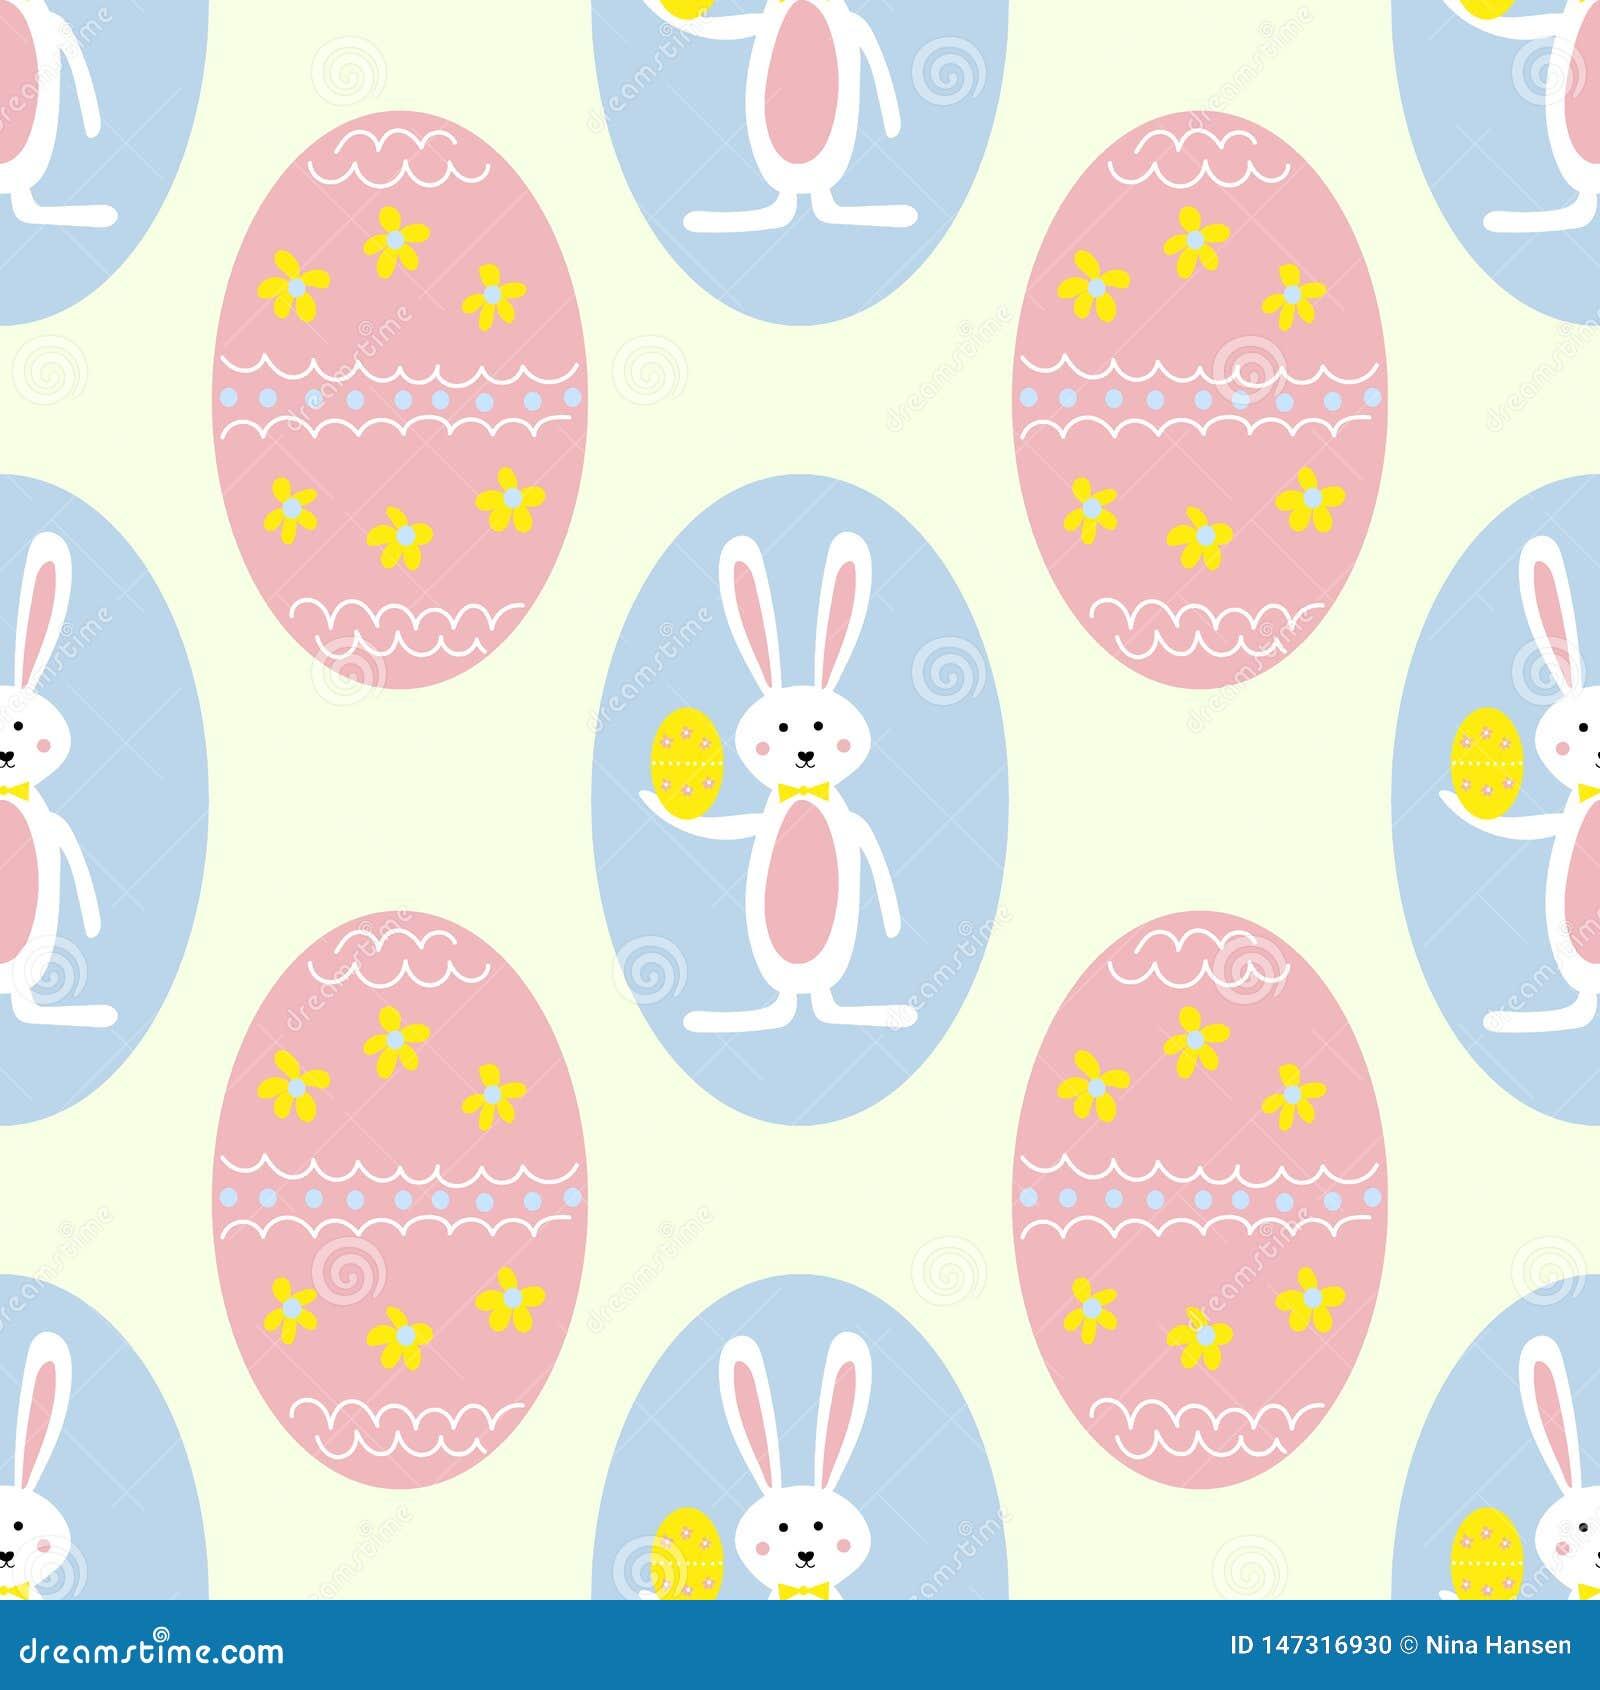 Huevos y Bunny Seamless Pattern Print Background coloridos de Pascua